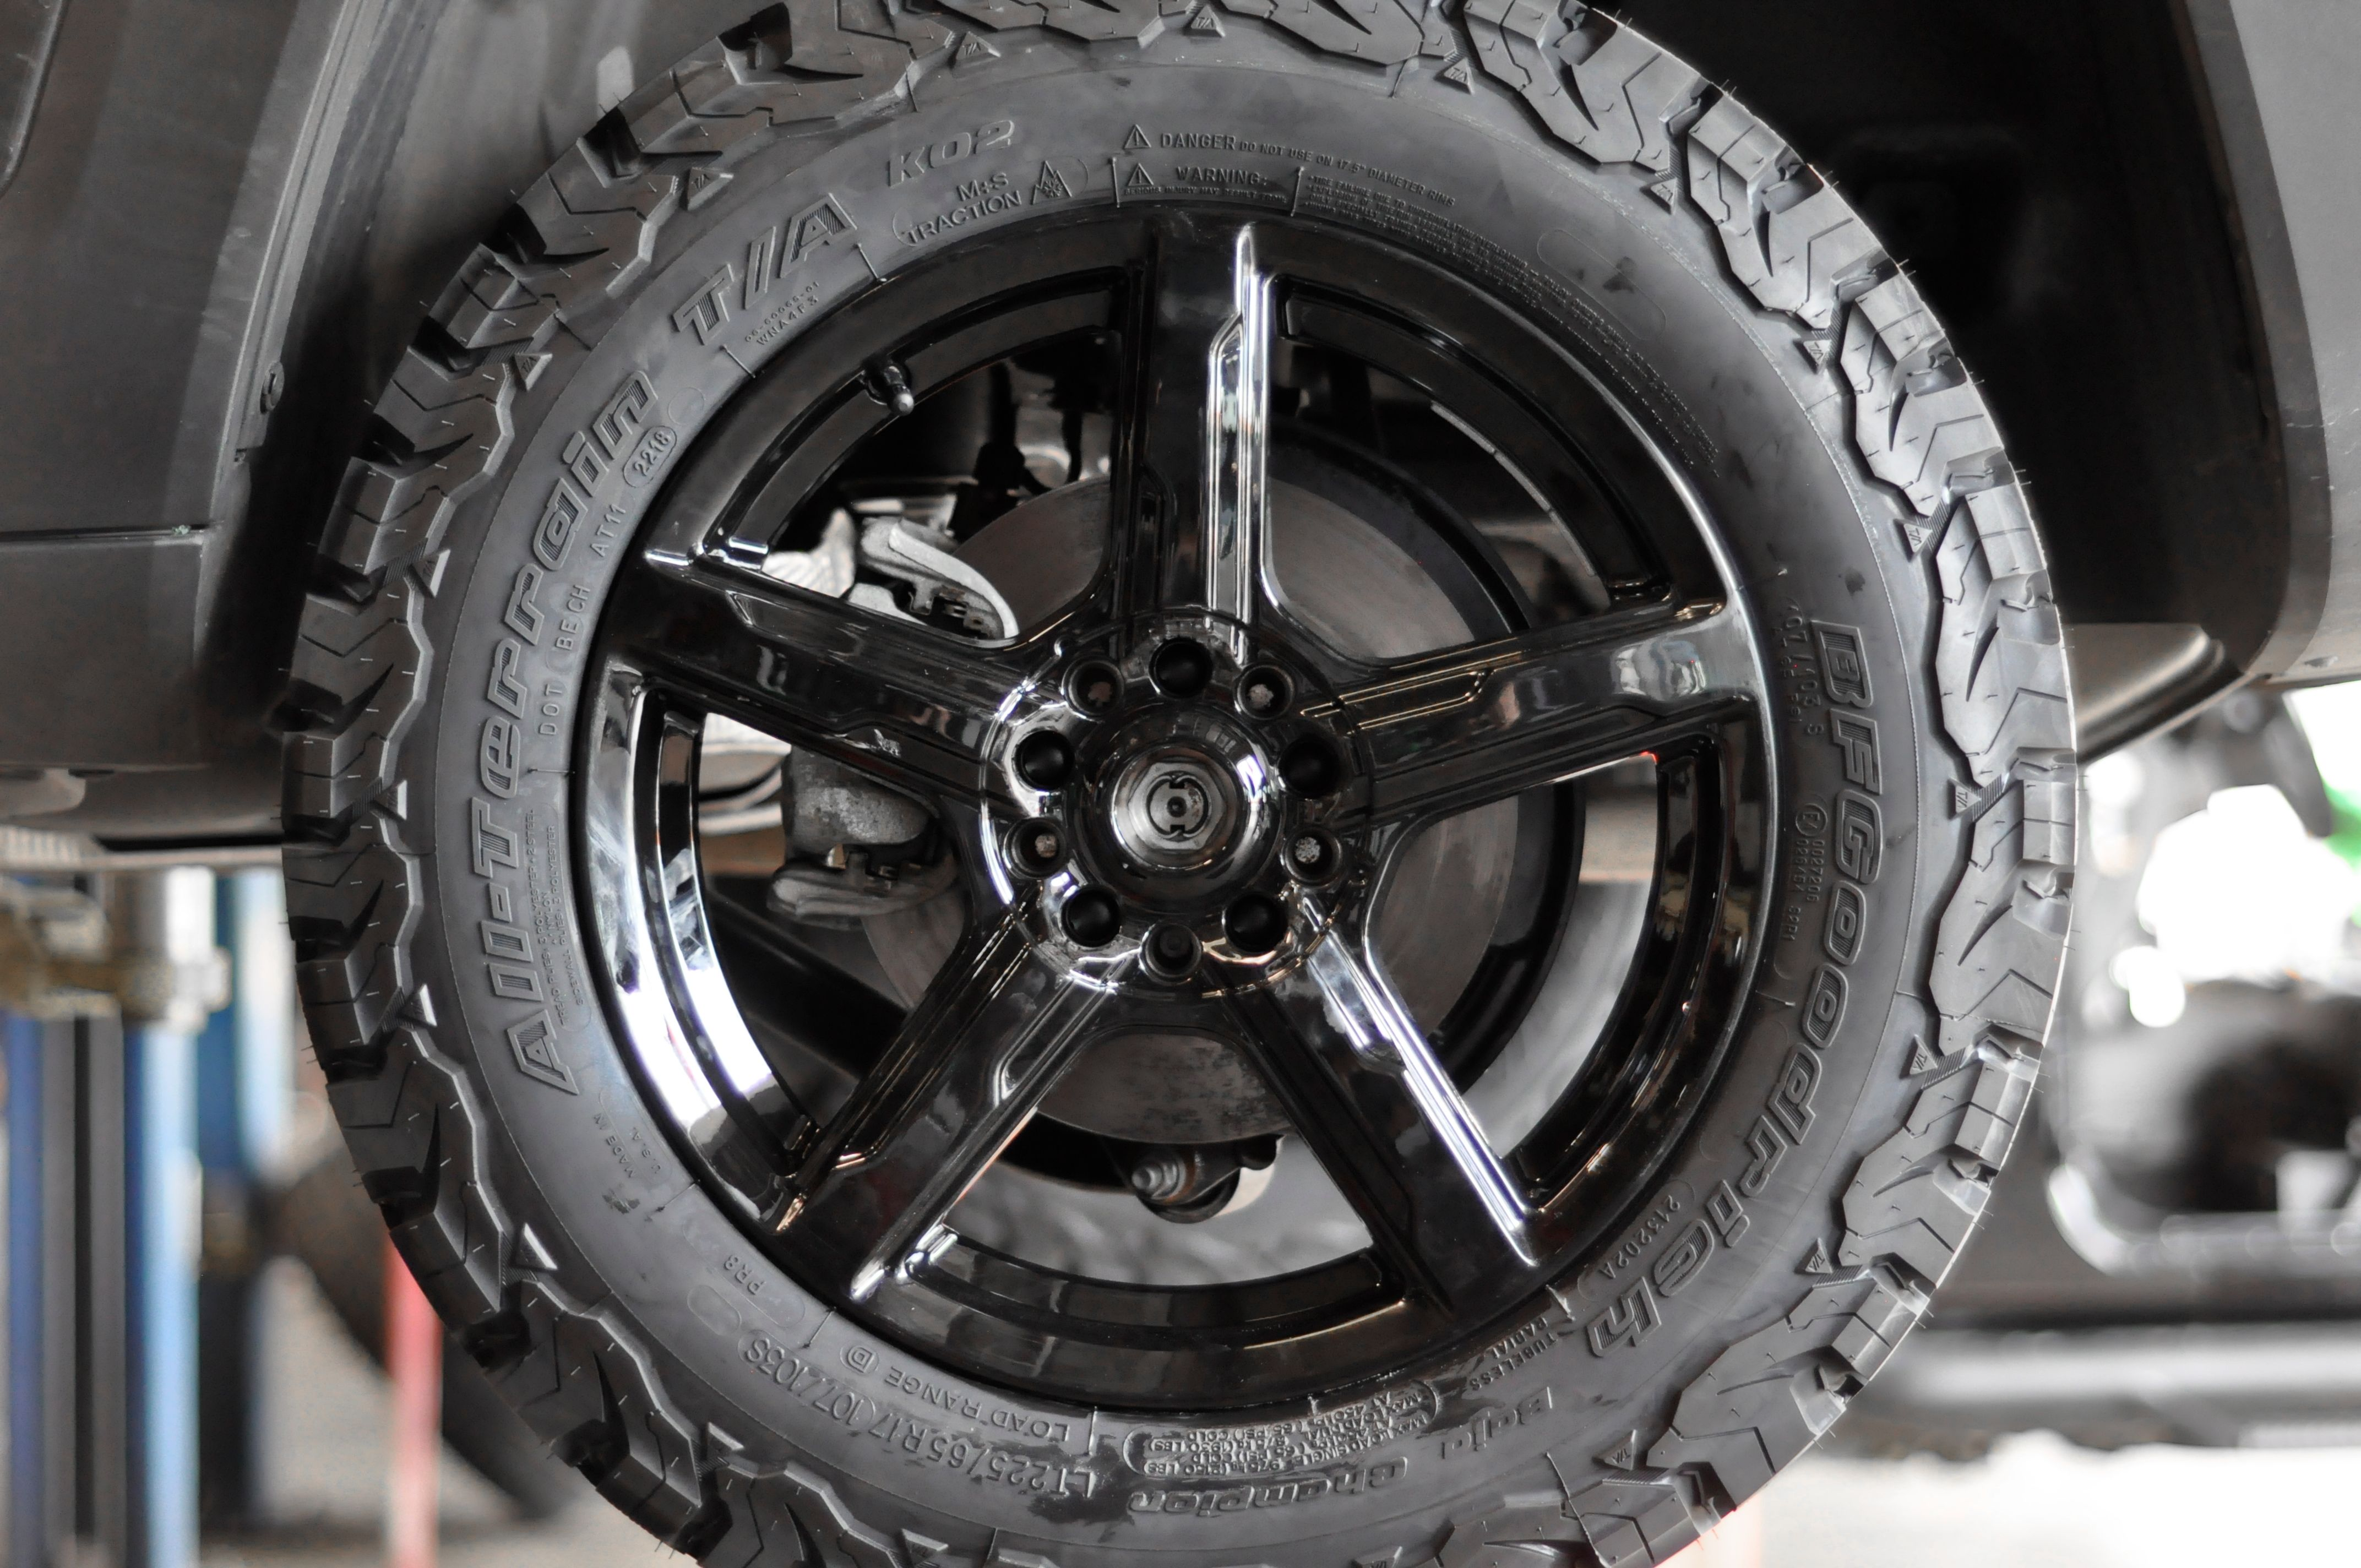 225 65r17 Bf Goodrich Ko2 Tire Under A 2018 Jeep Renegade